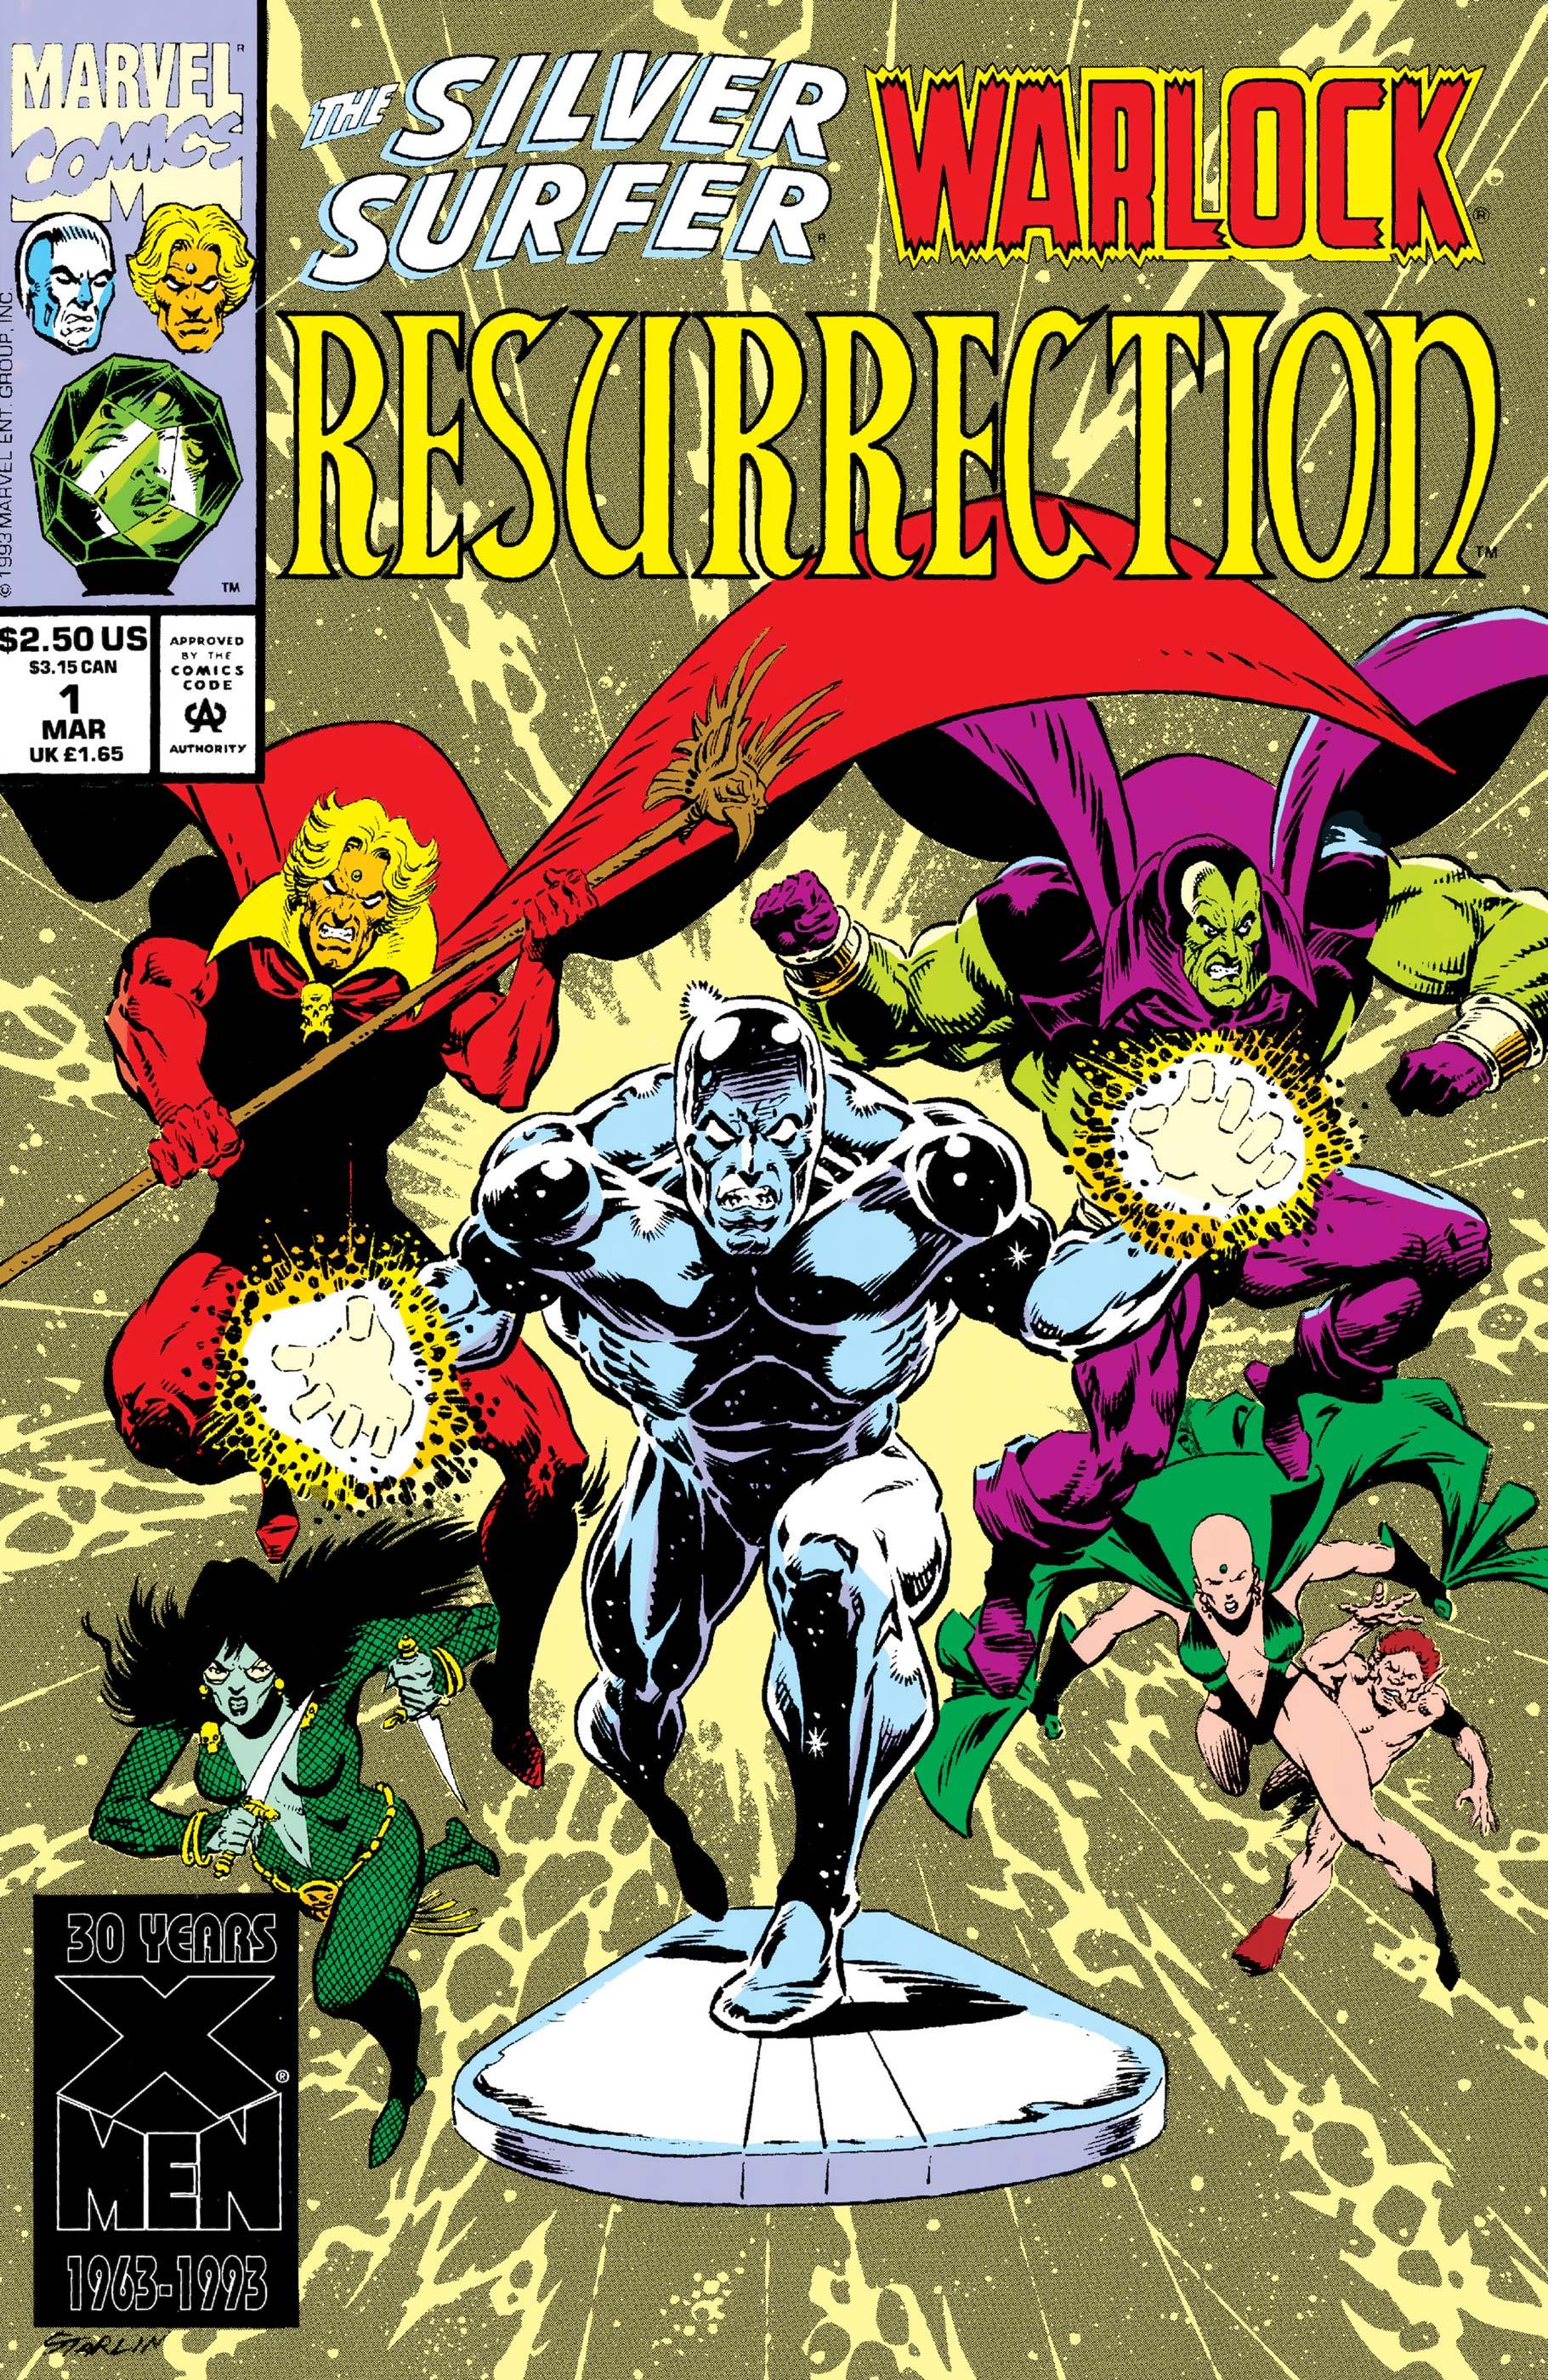 Silver Surfer/Warlock: Resurrection (1993) #1